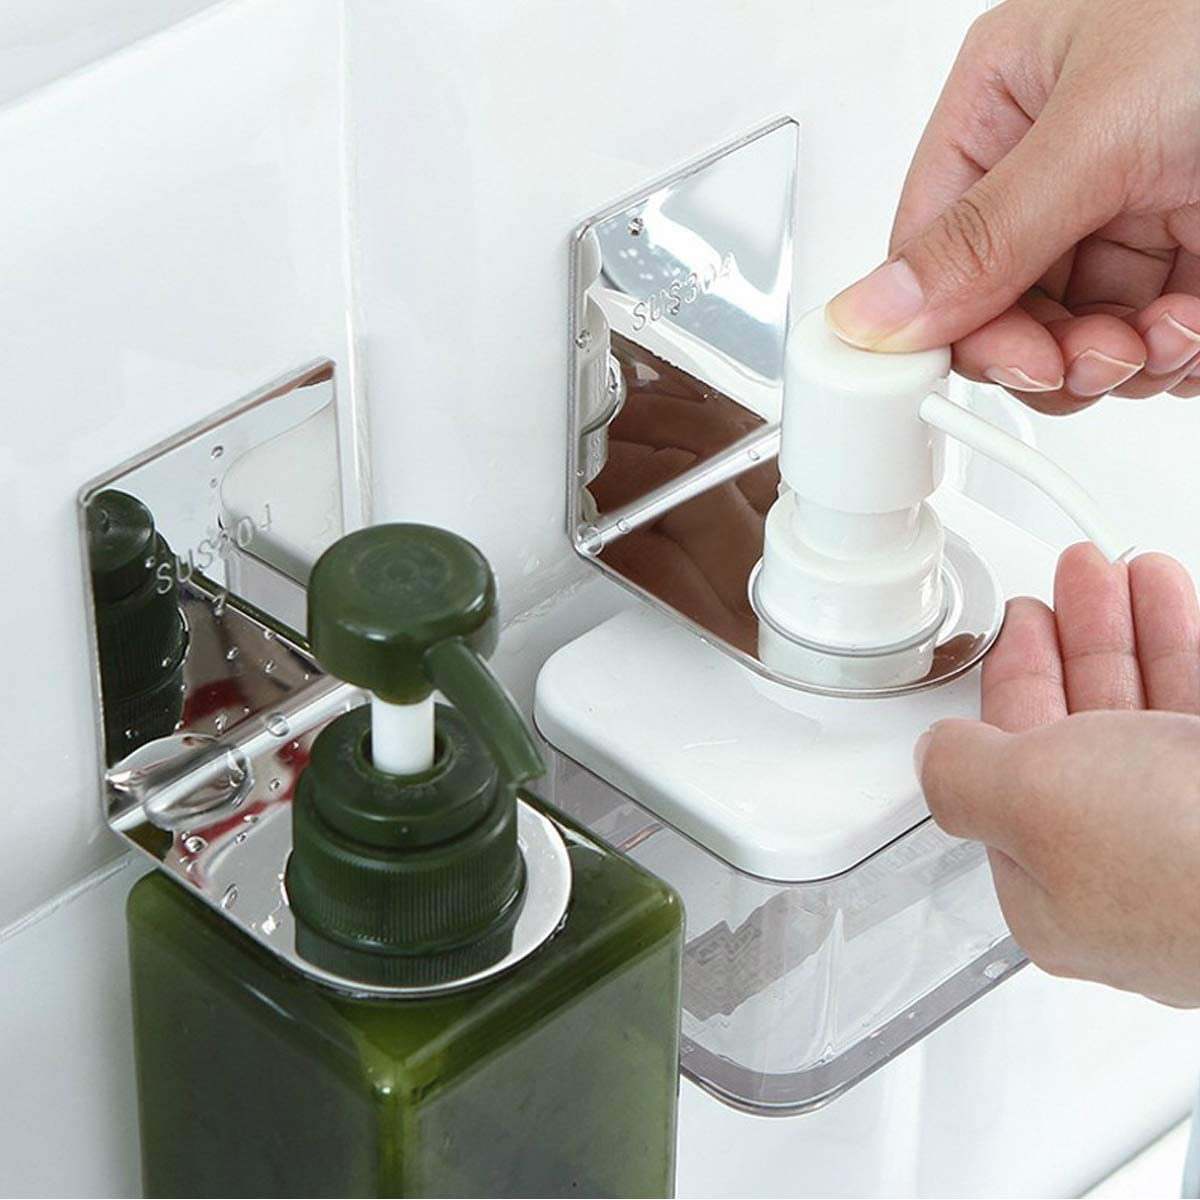 SOFTBATFY Bottle Dispenser Hooks (2 Pieces)